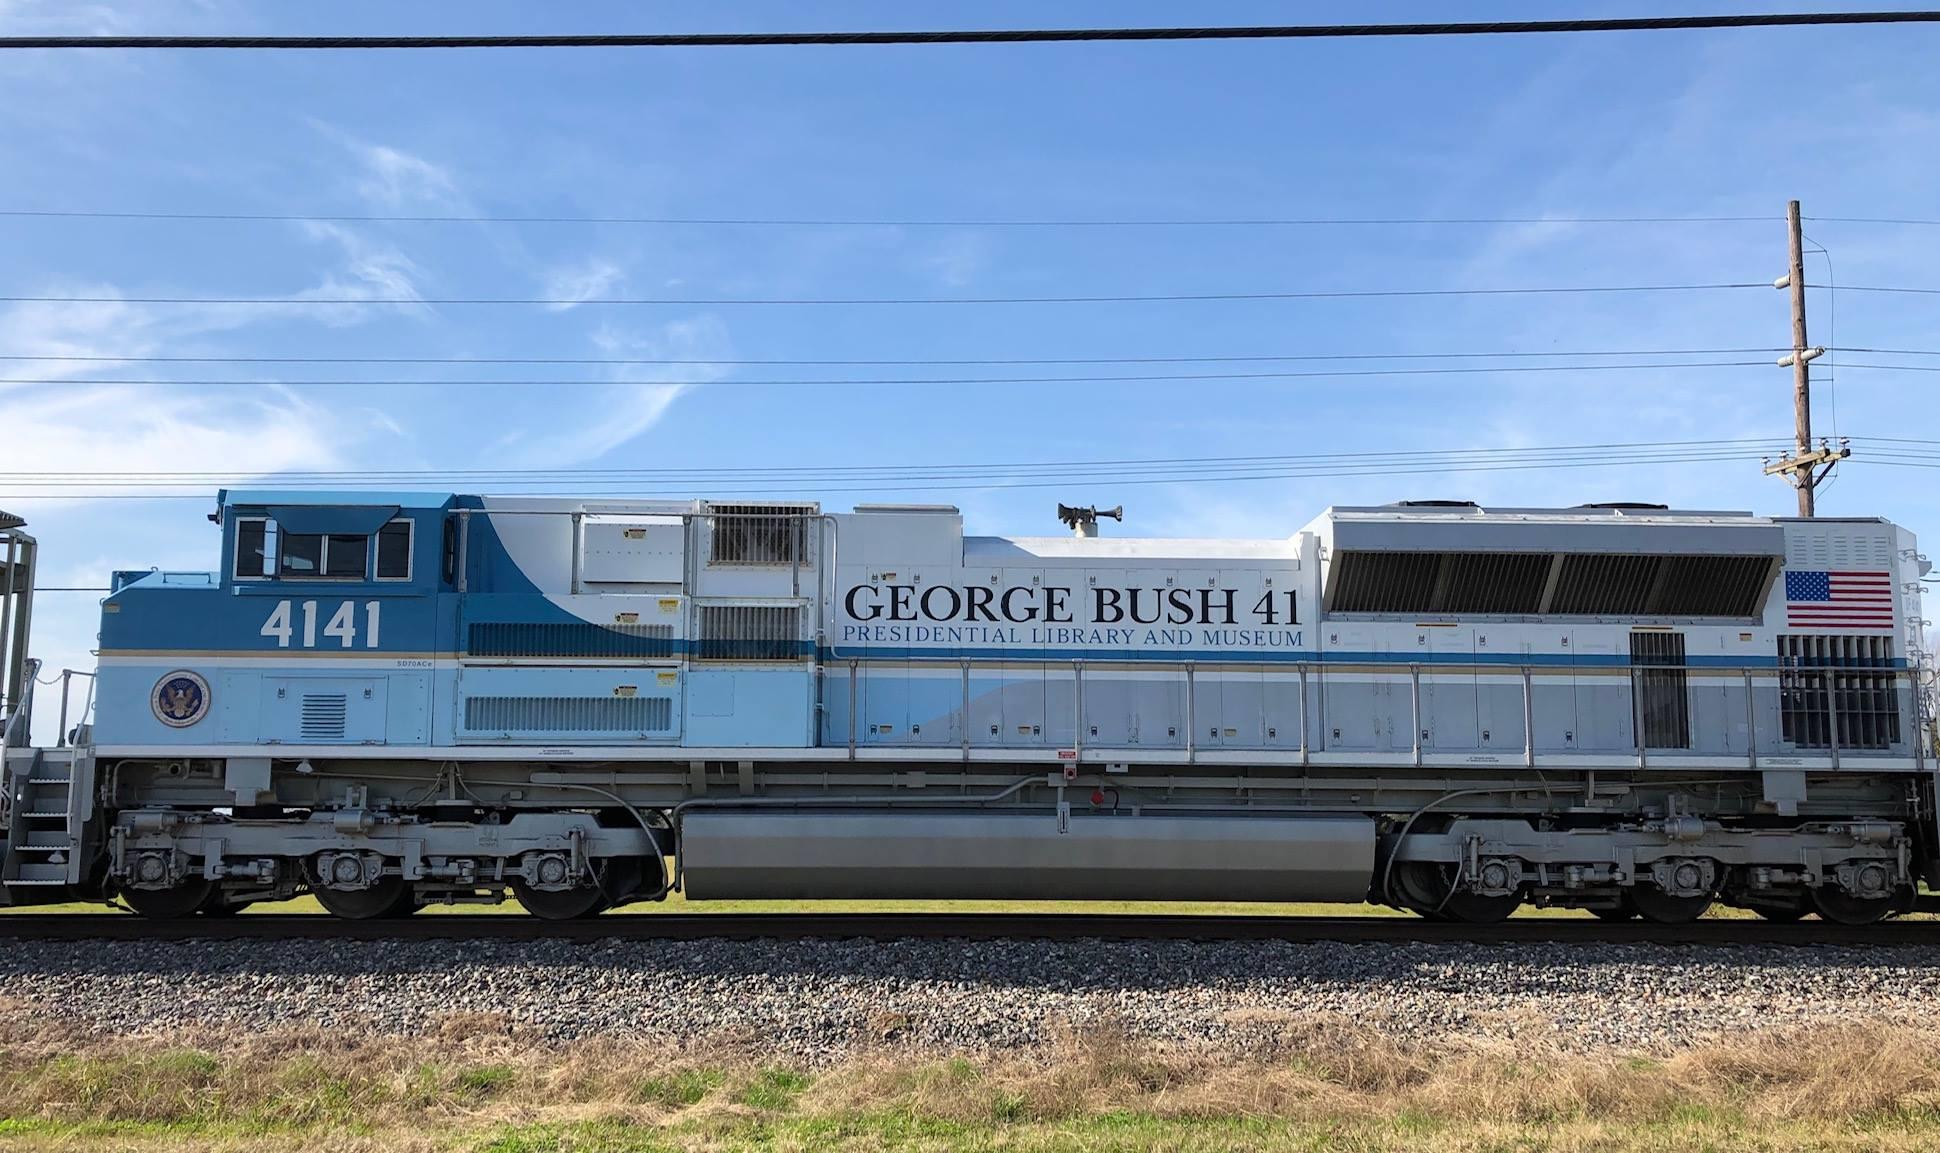 'Bush 4141' makes stop in Natchitoches_1546905240050.jpg.jpg